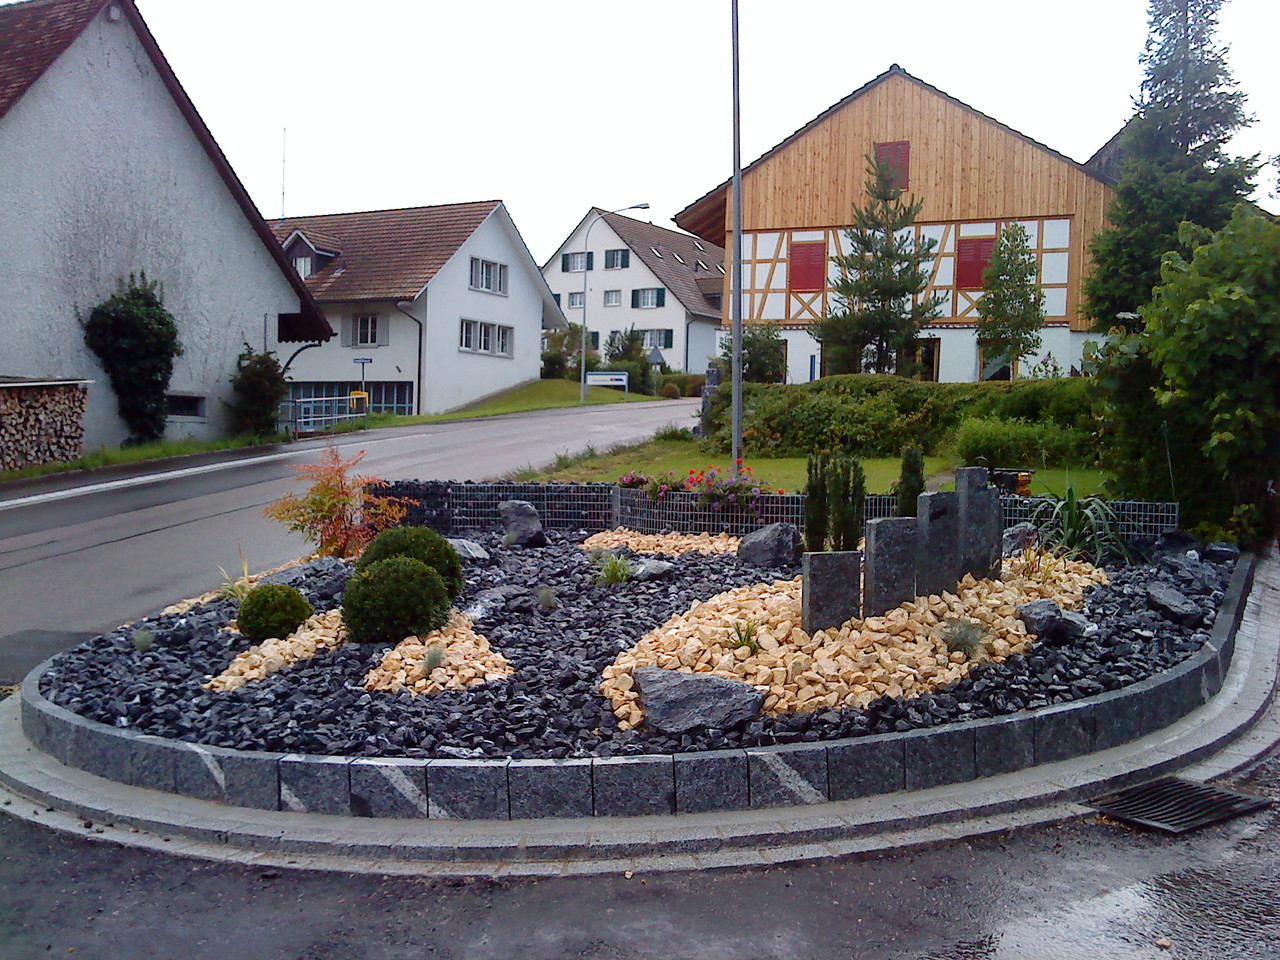 Gartendesign Eicher - Gartendesign Eicher - Gartendesign ... Garten Design Garten Gestaltung